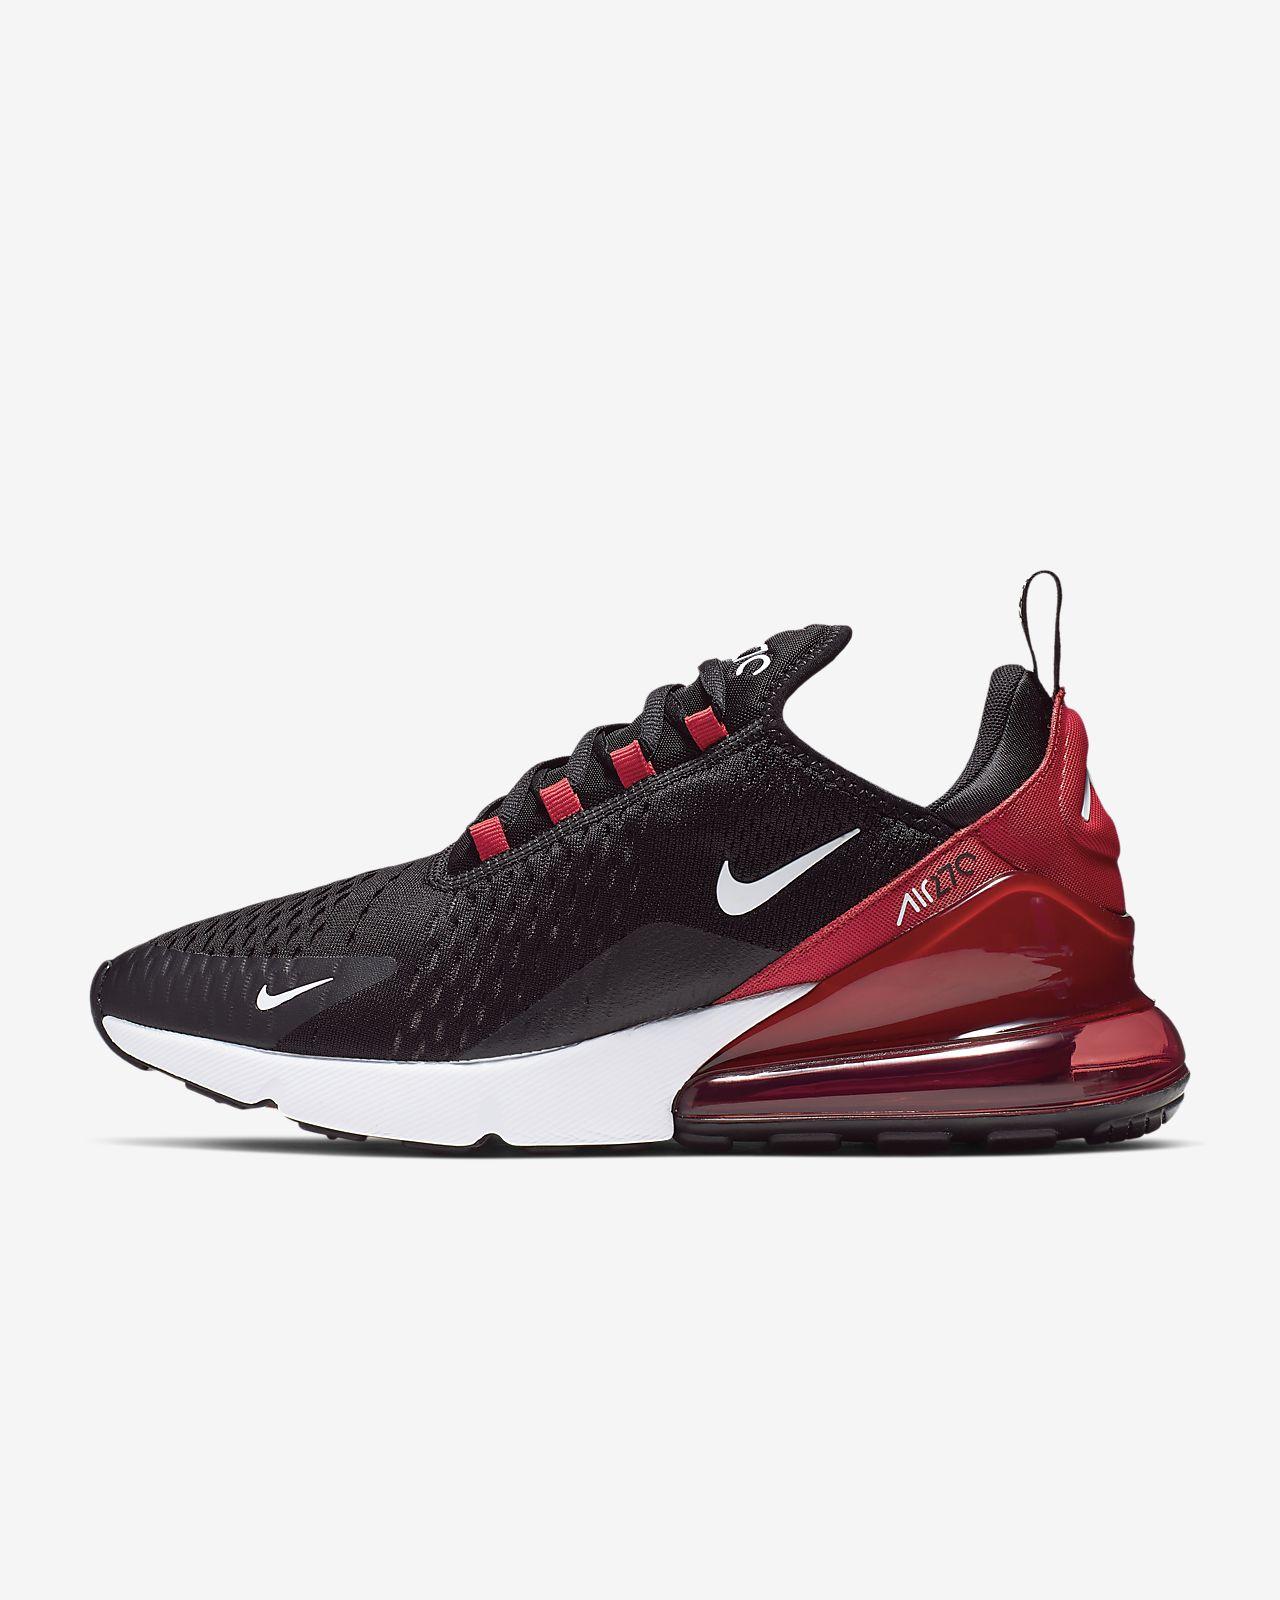 new style 8114c dd669 ... Nike Air Max 270 – sko til mænd